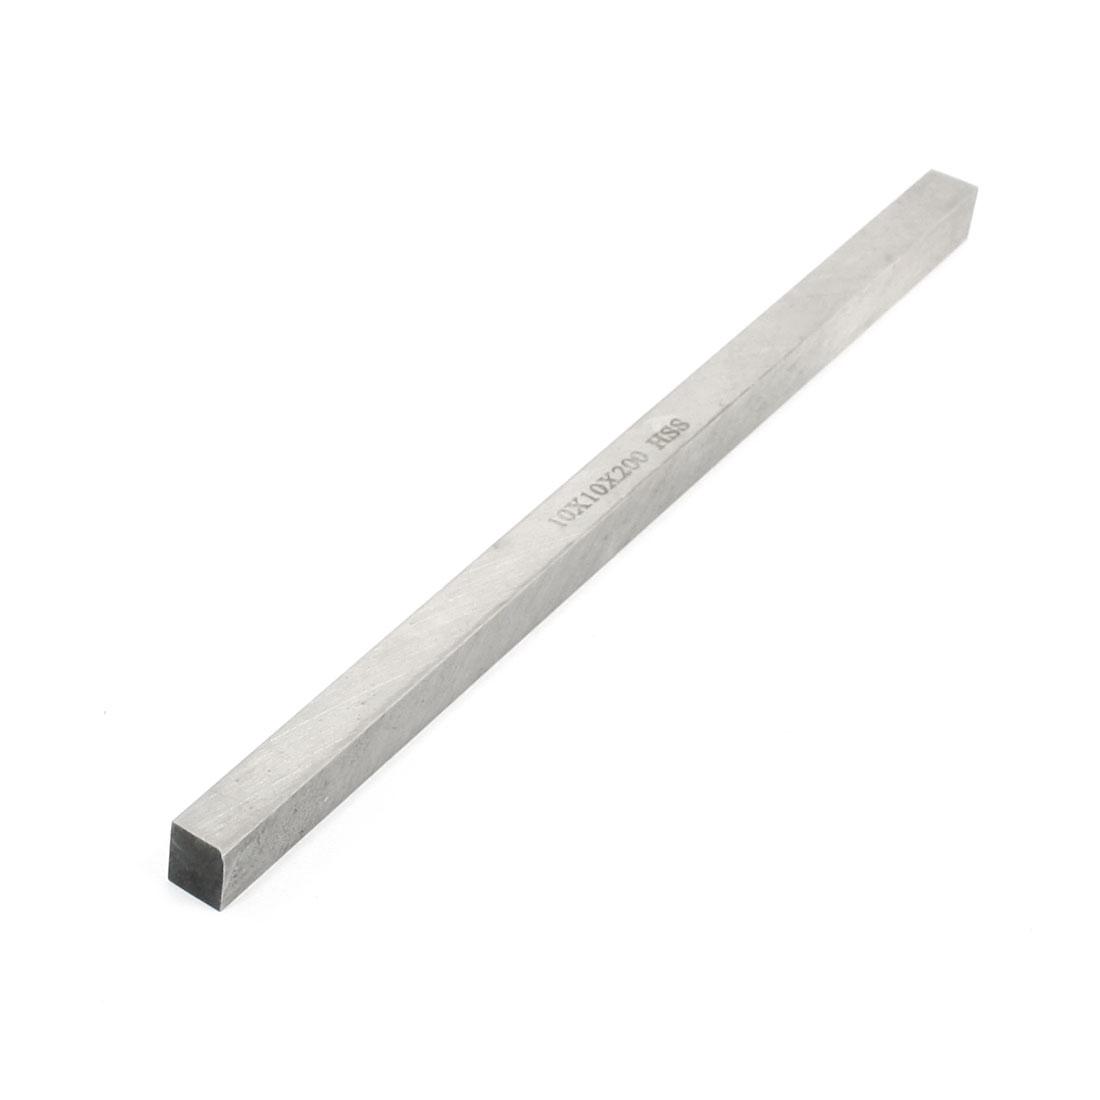 10mm x 10mm x 200mm Turning Parting Milling Lathe HSS Tool Bit Gray